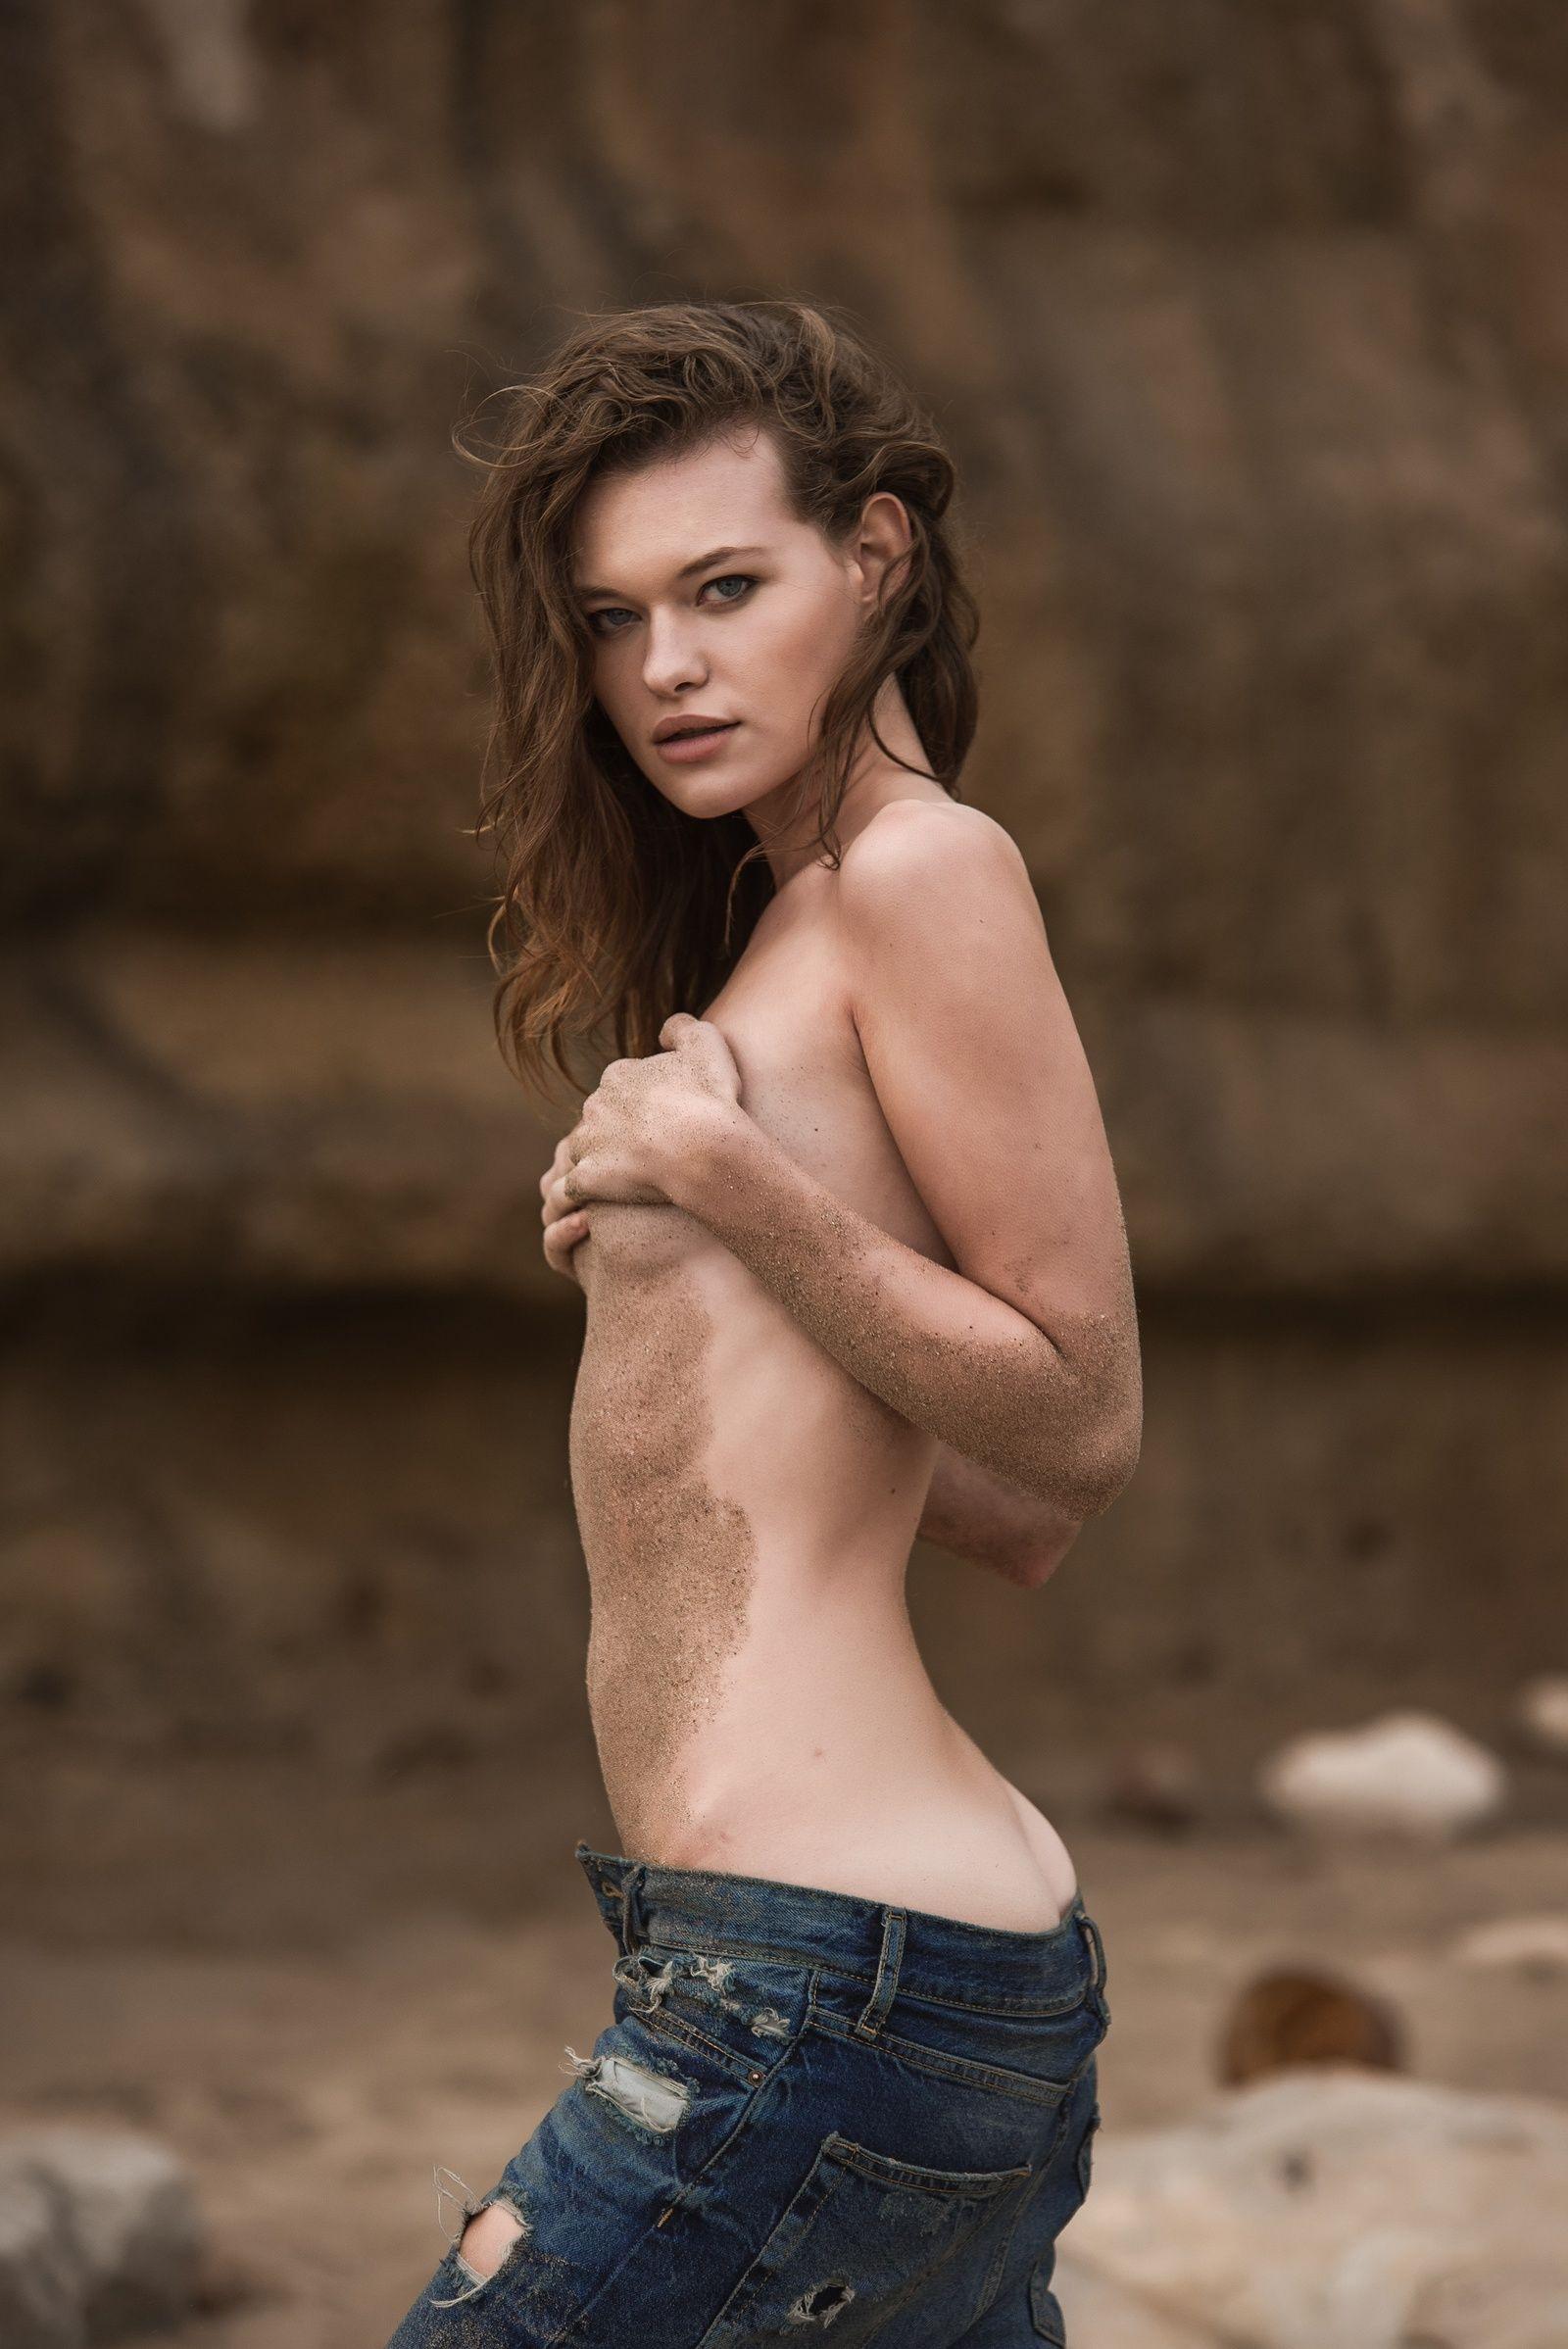 pics ClaraBabyLegs Nude Photos and Videos